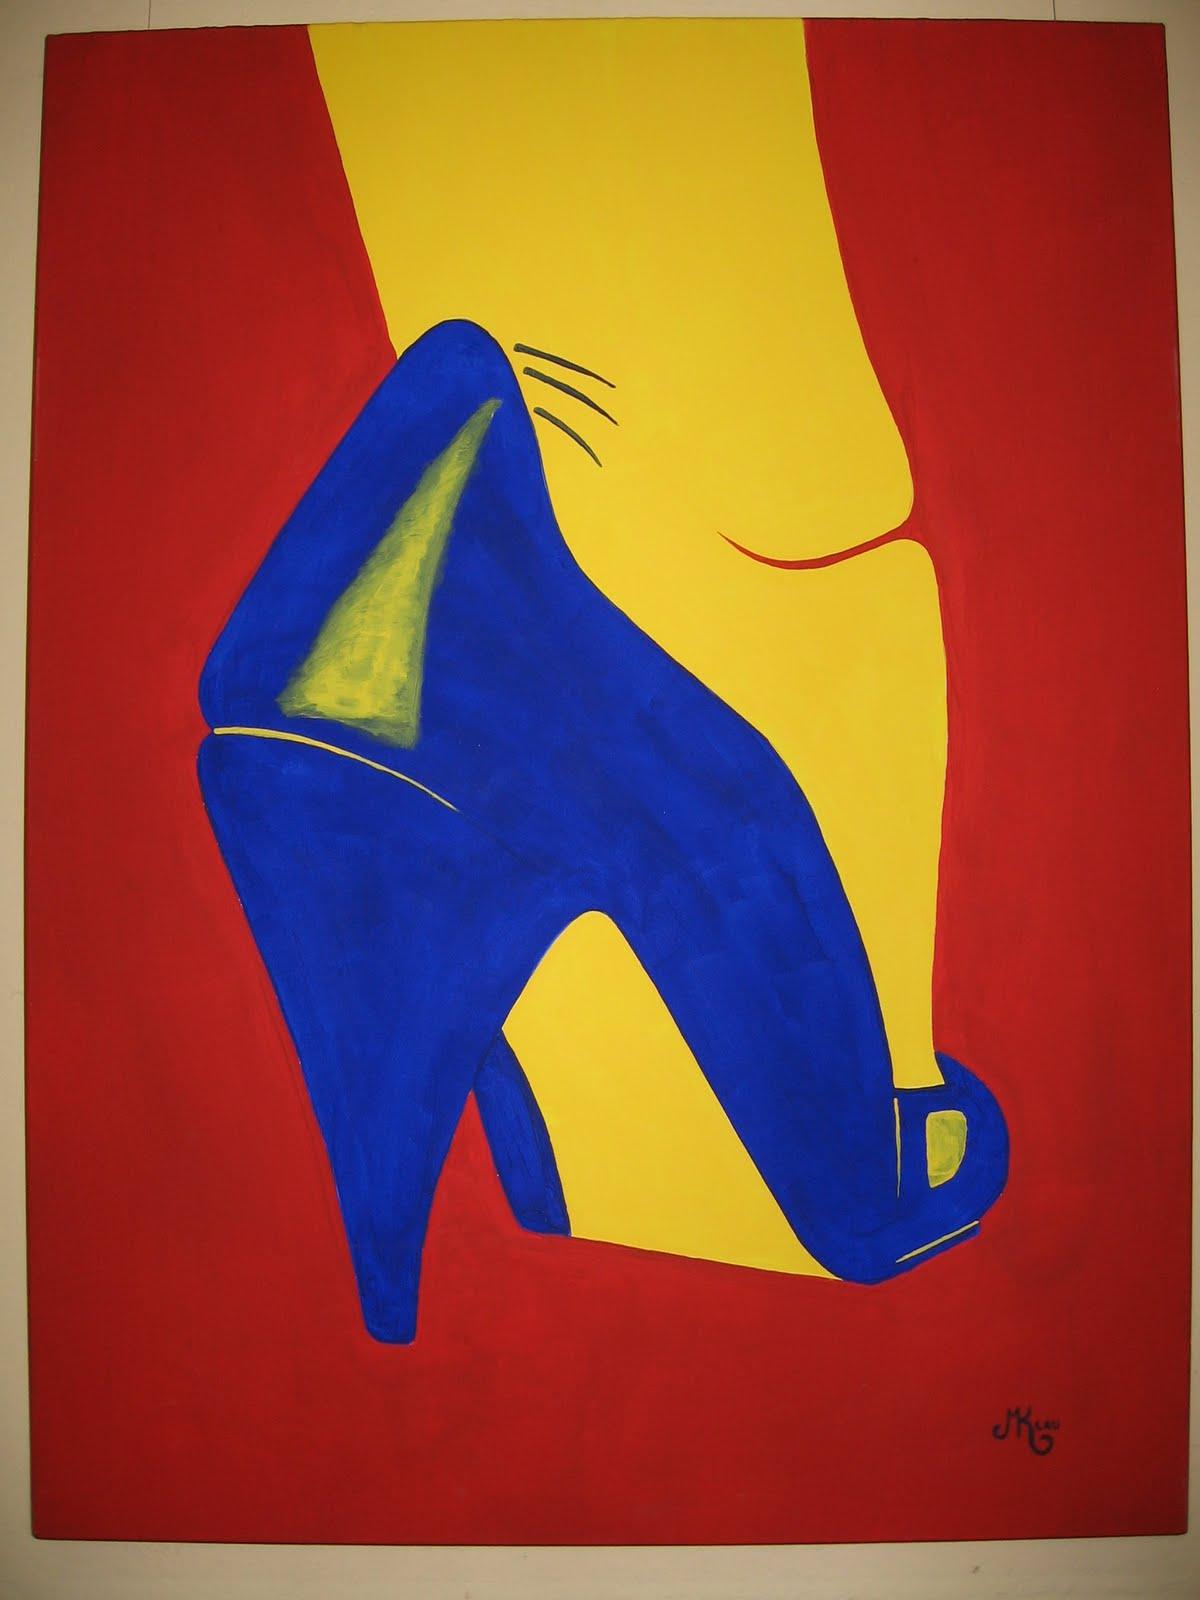 Givoa pinturas a expertizar de los alumnos de artes - Nombres de colores de pinturas ...